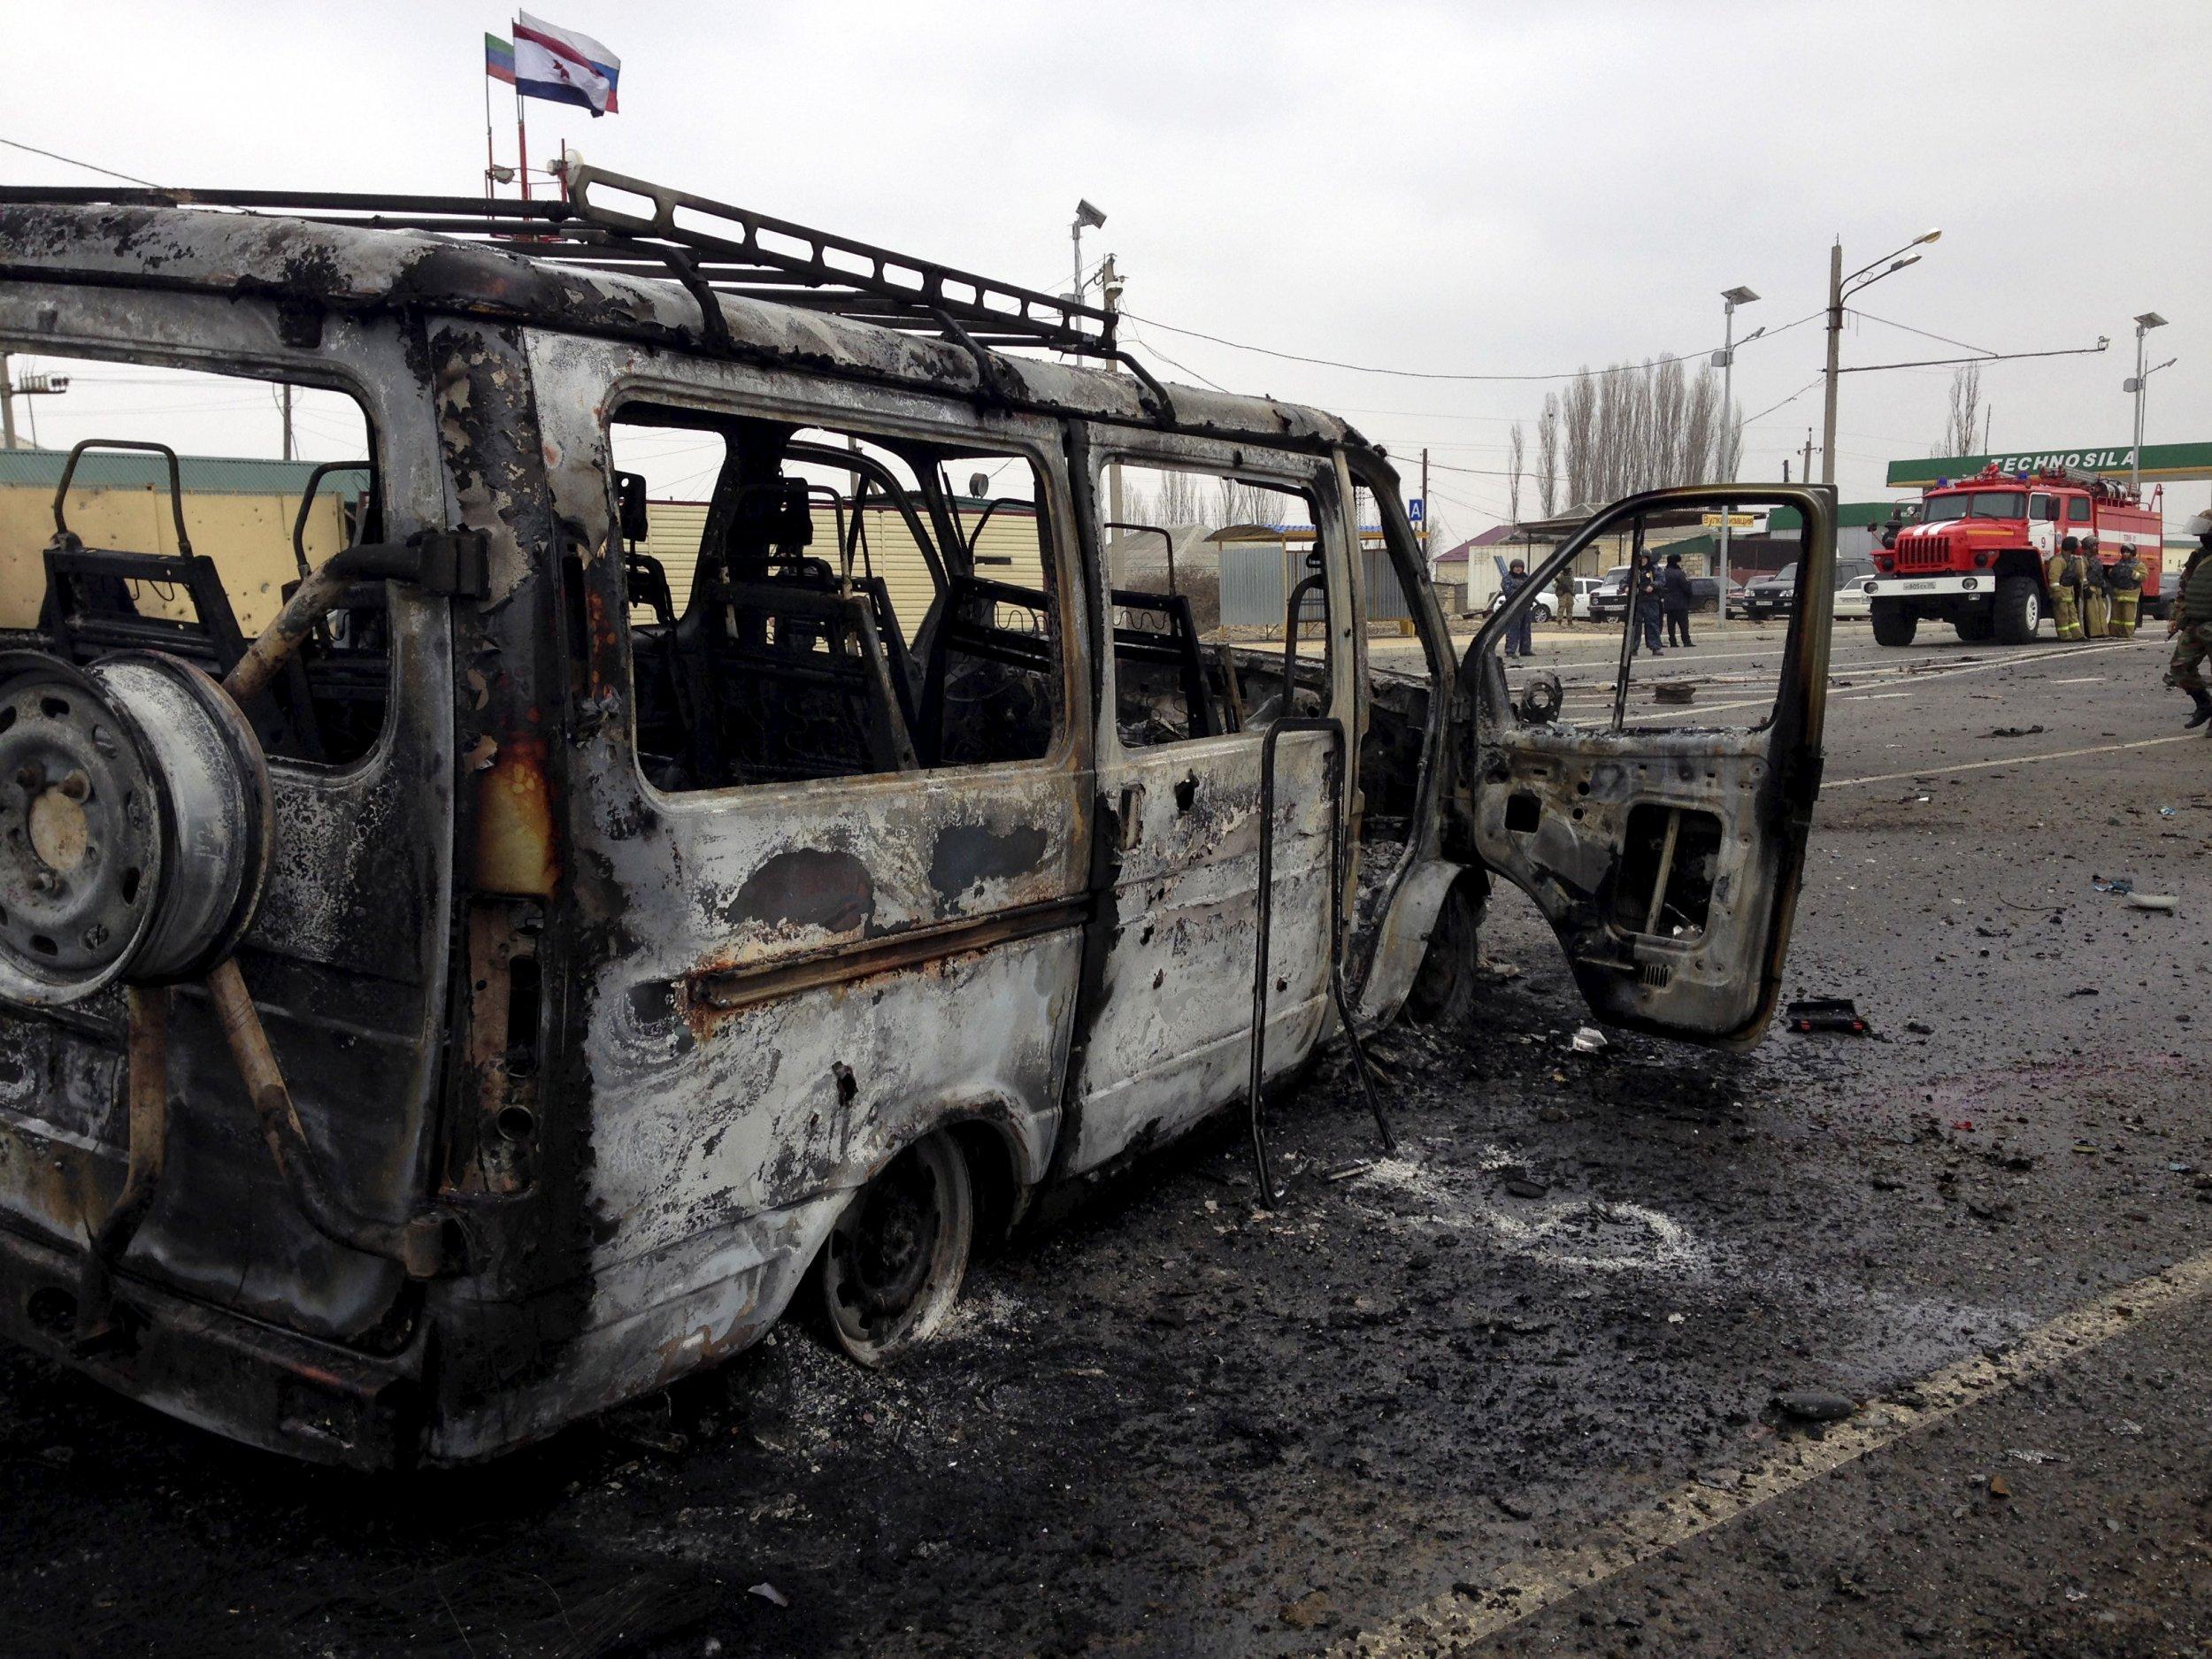 Burnt car in Russia's Dagestan region